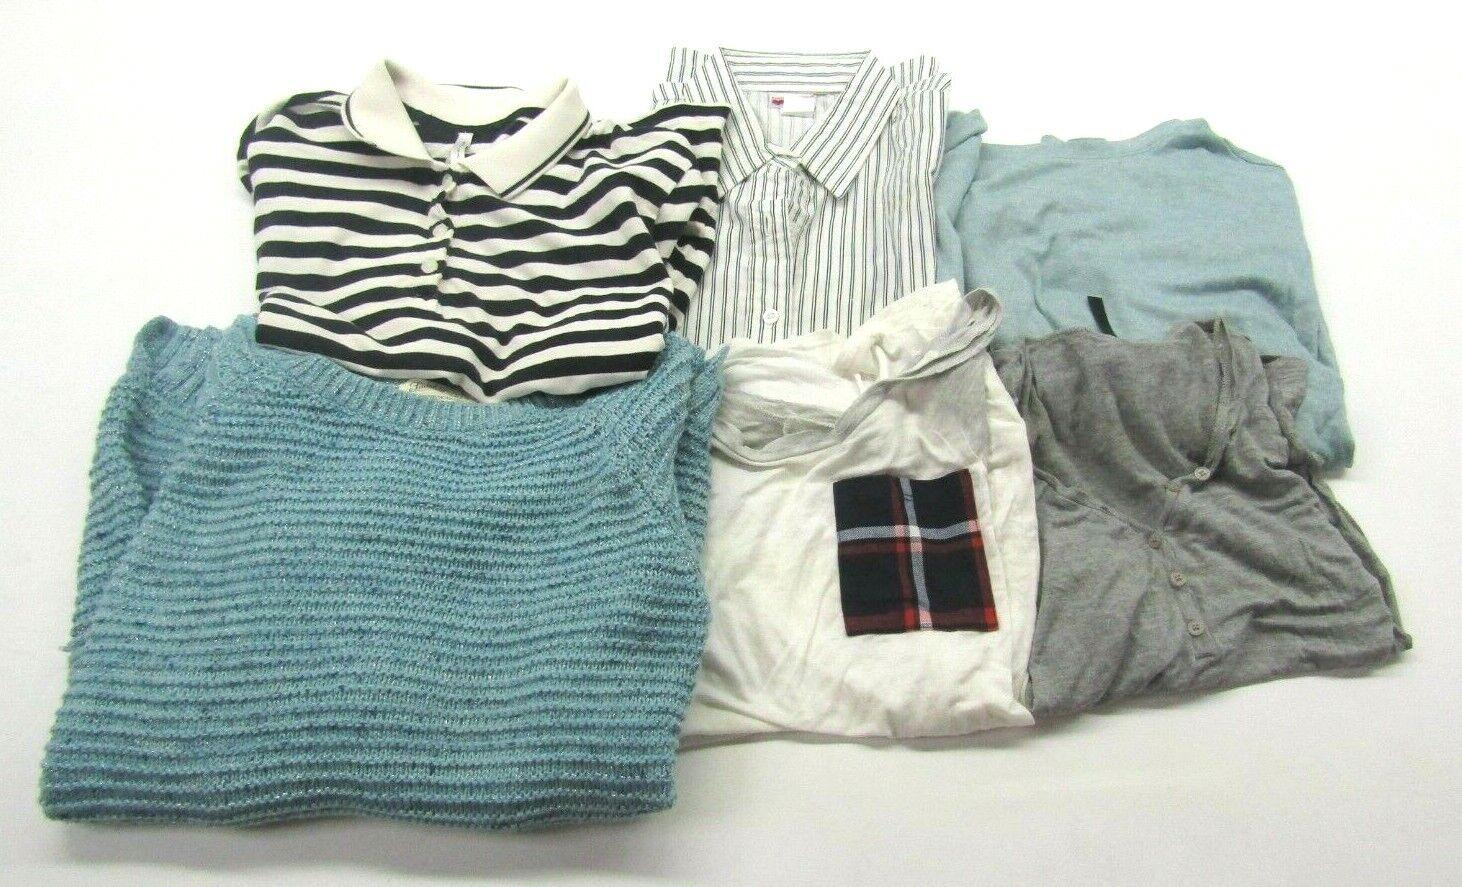 Women's Medium Mixed Brands & Styles Sweater, Blouse, T-Shirt Tops Lot of 6